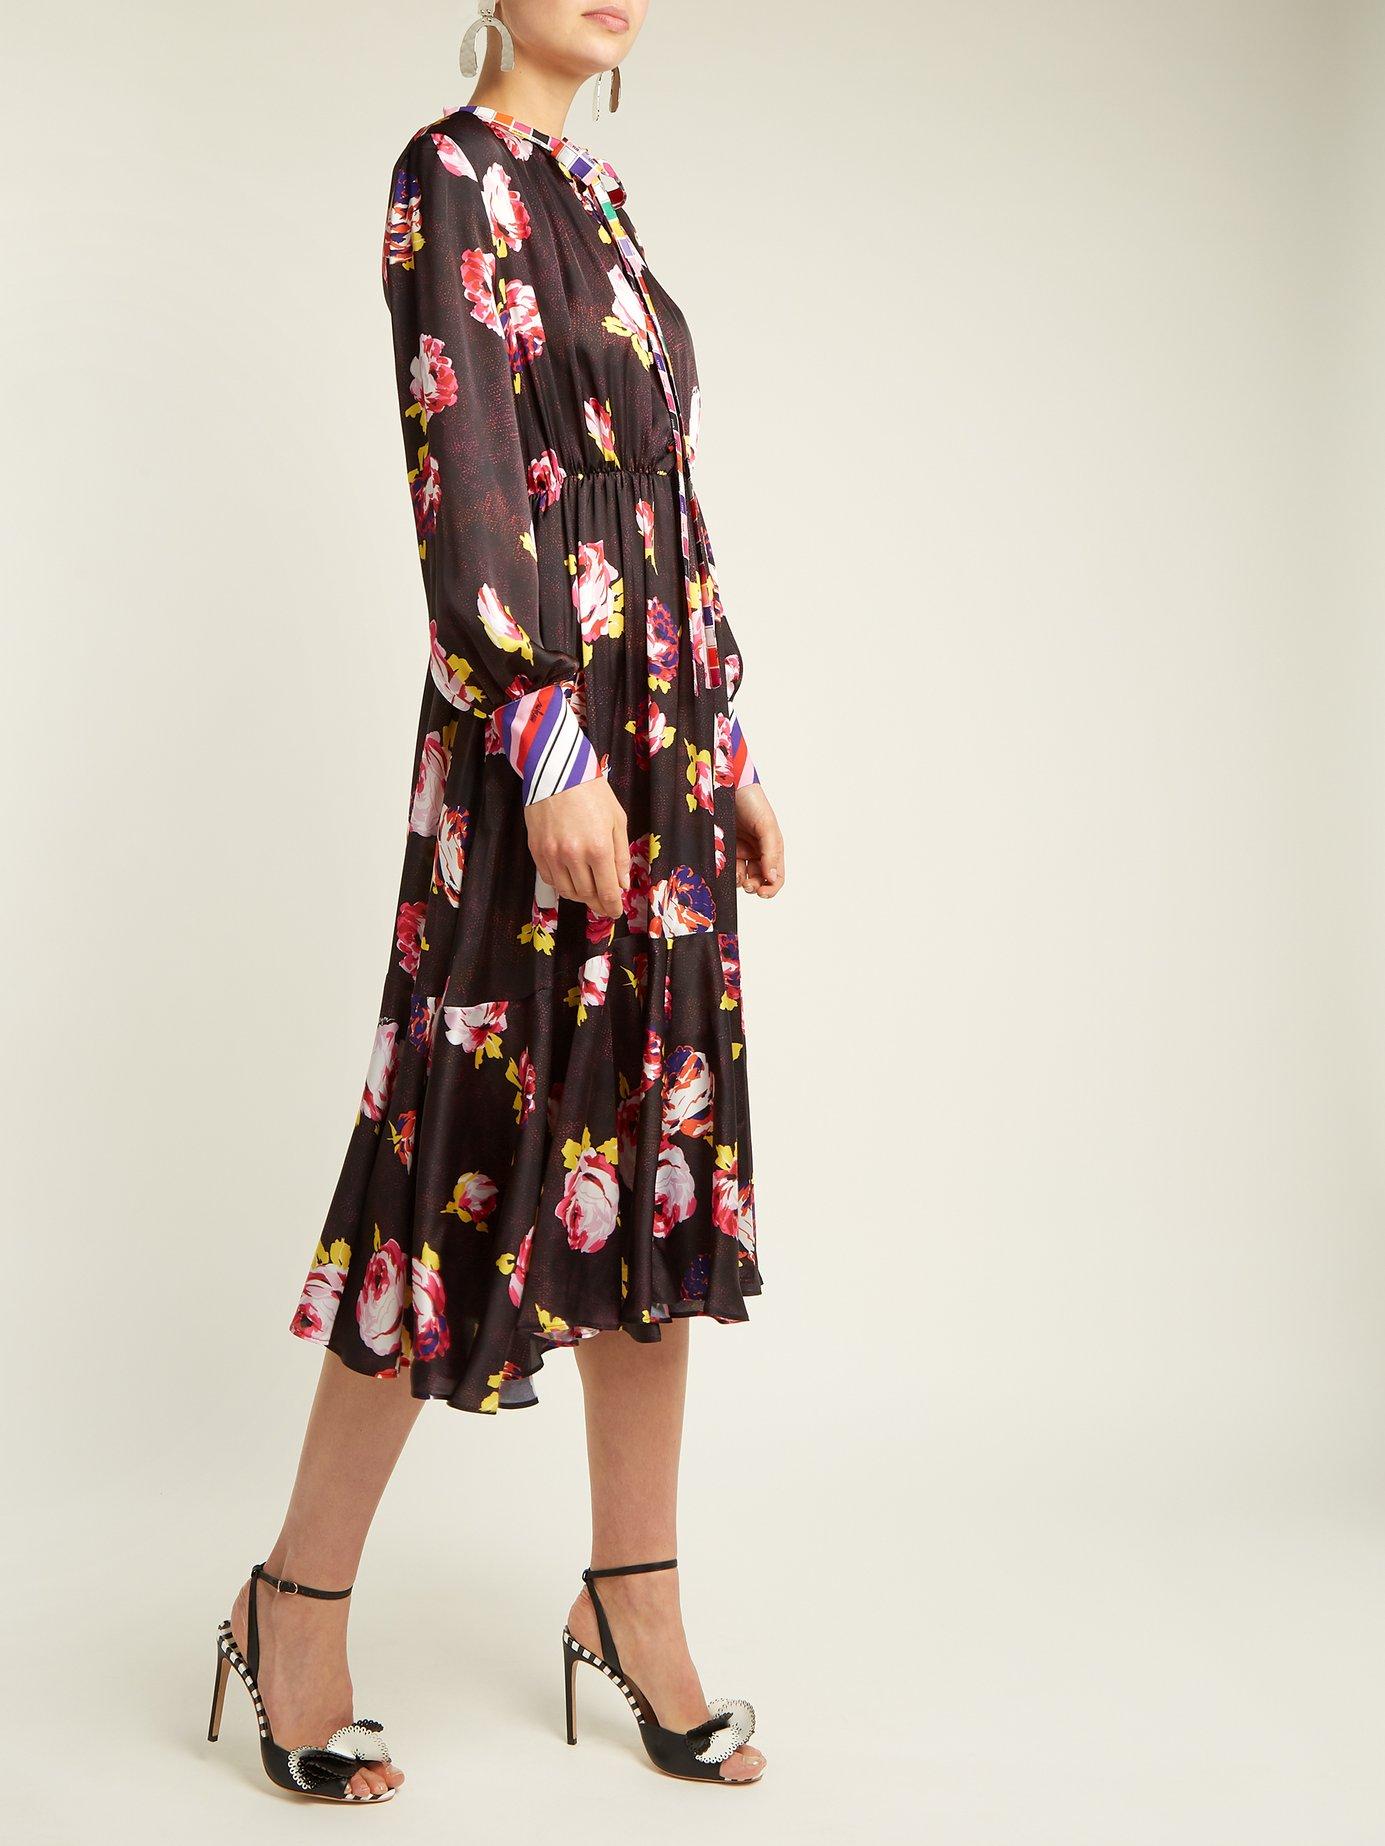 Rose-print satin midi dress by Msgm